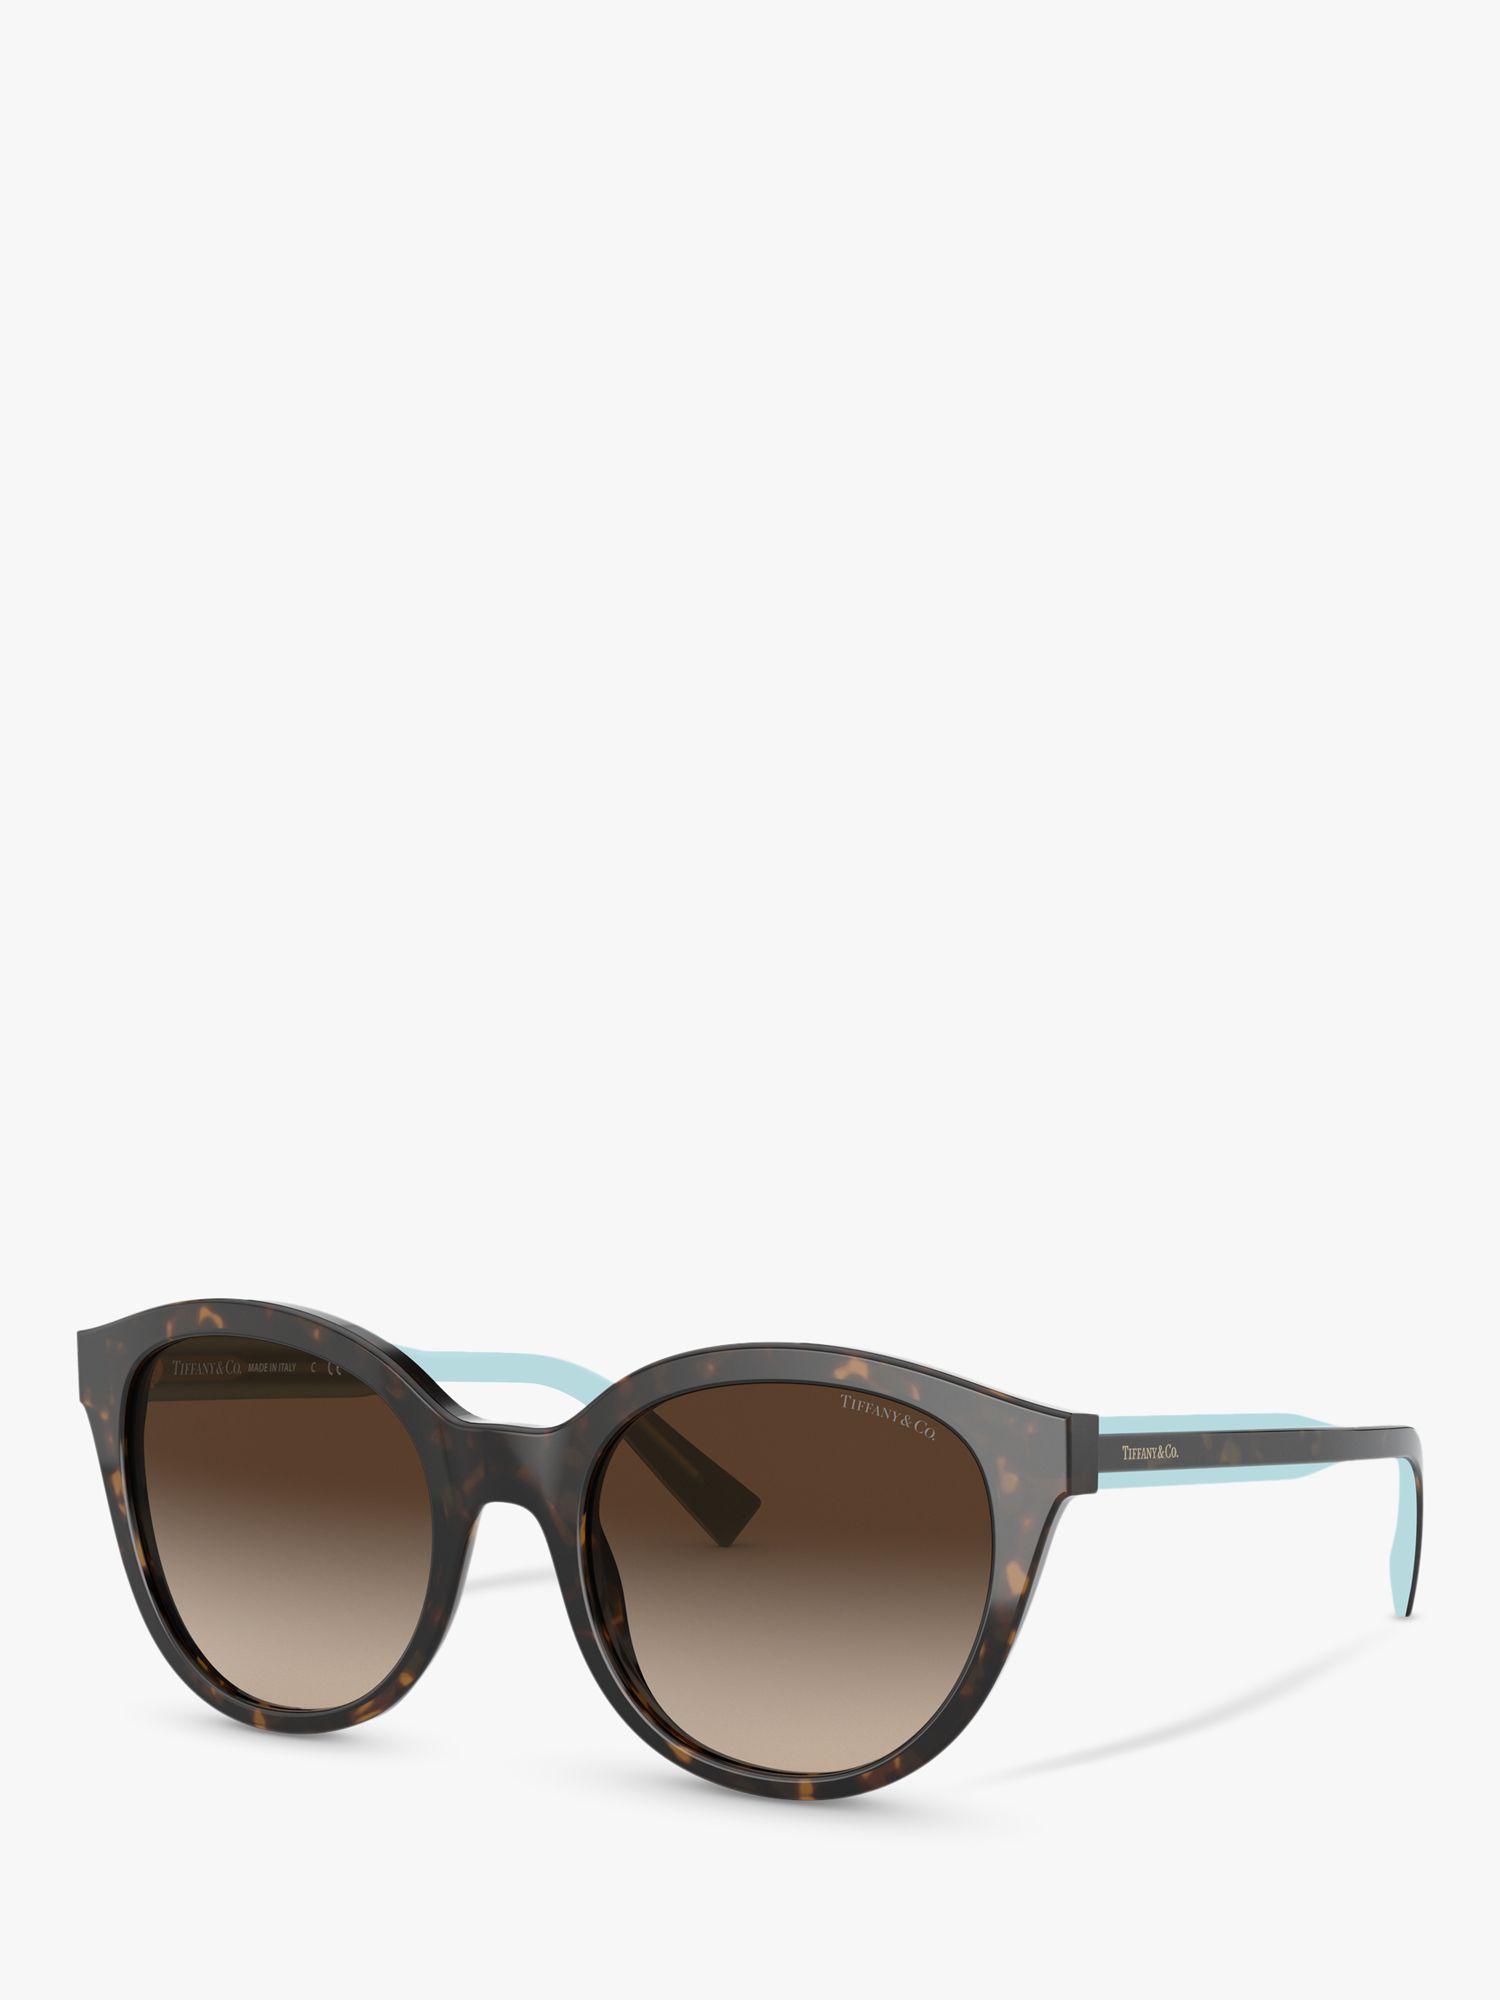 Tiffany & Co Tiffany & Co TF4164 Women's Oval Sunglasses, Havana/Brown Gradient